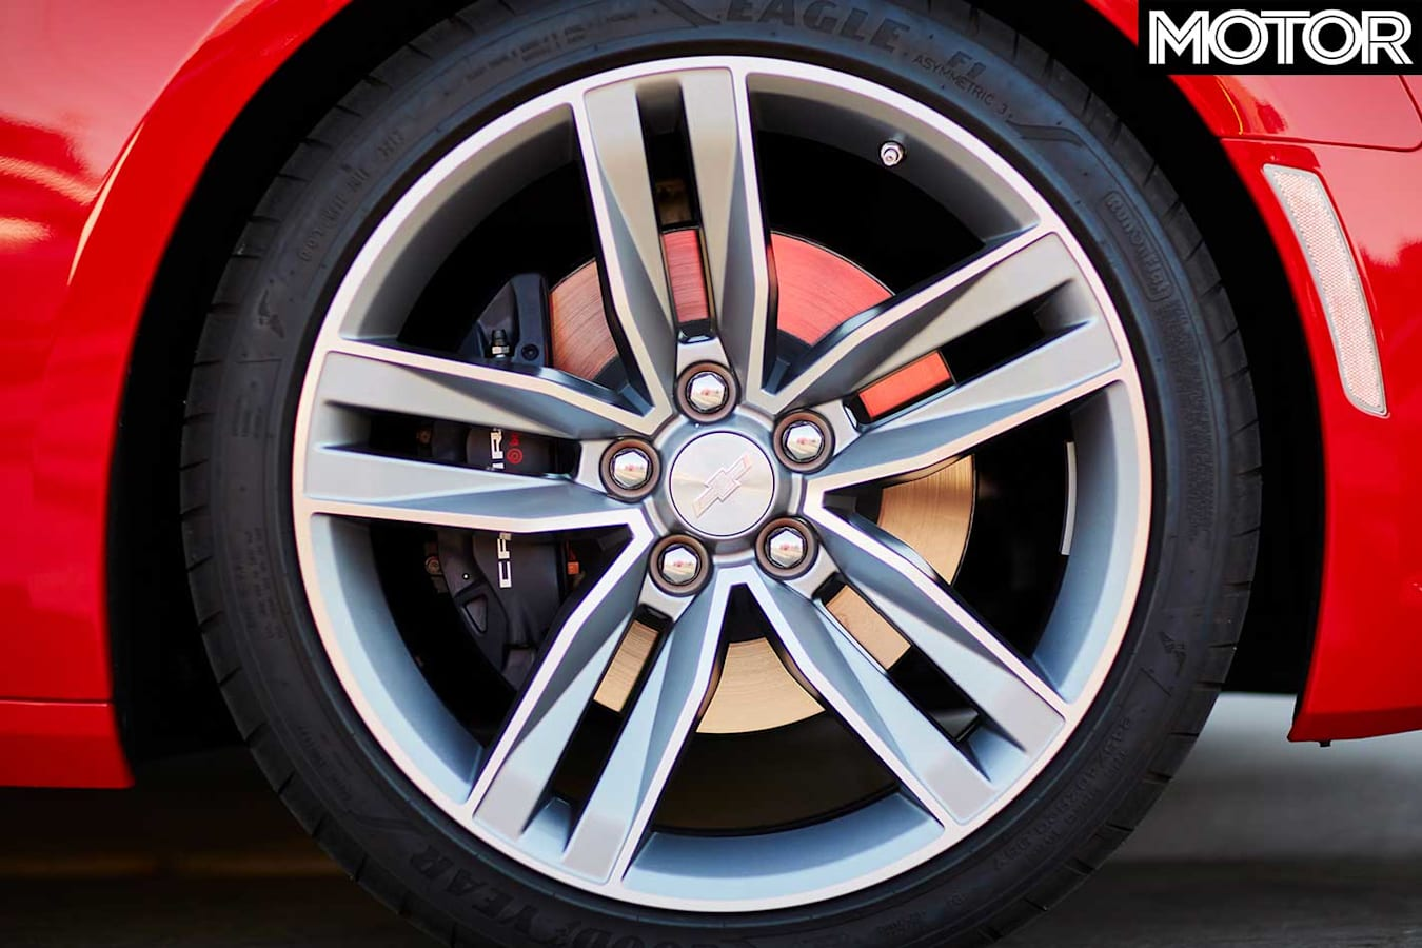 2018 Chevrolet Camaro 2 SS Wheel Brakes Jpg